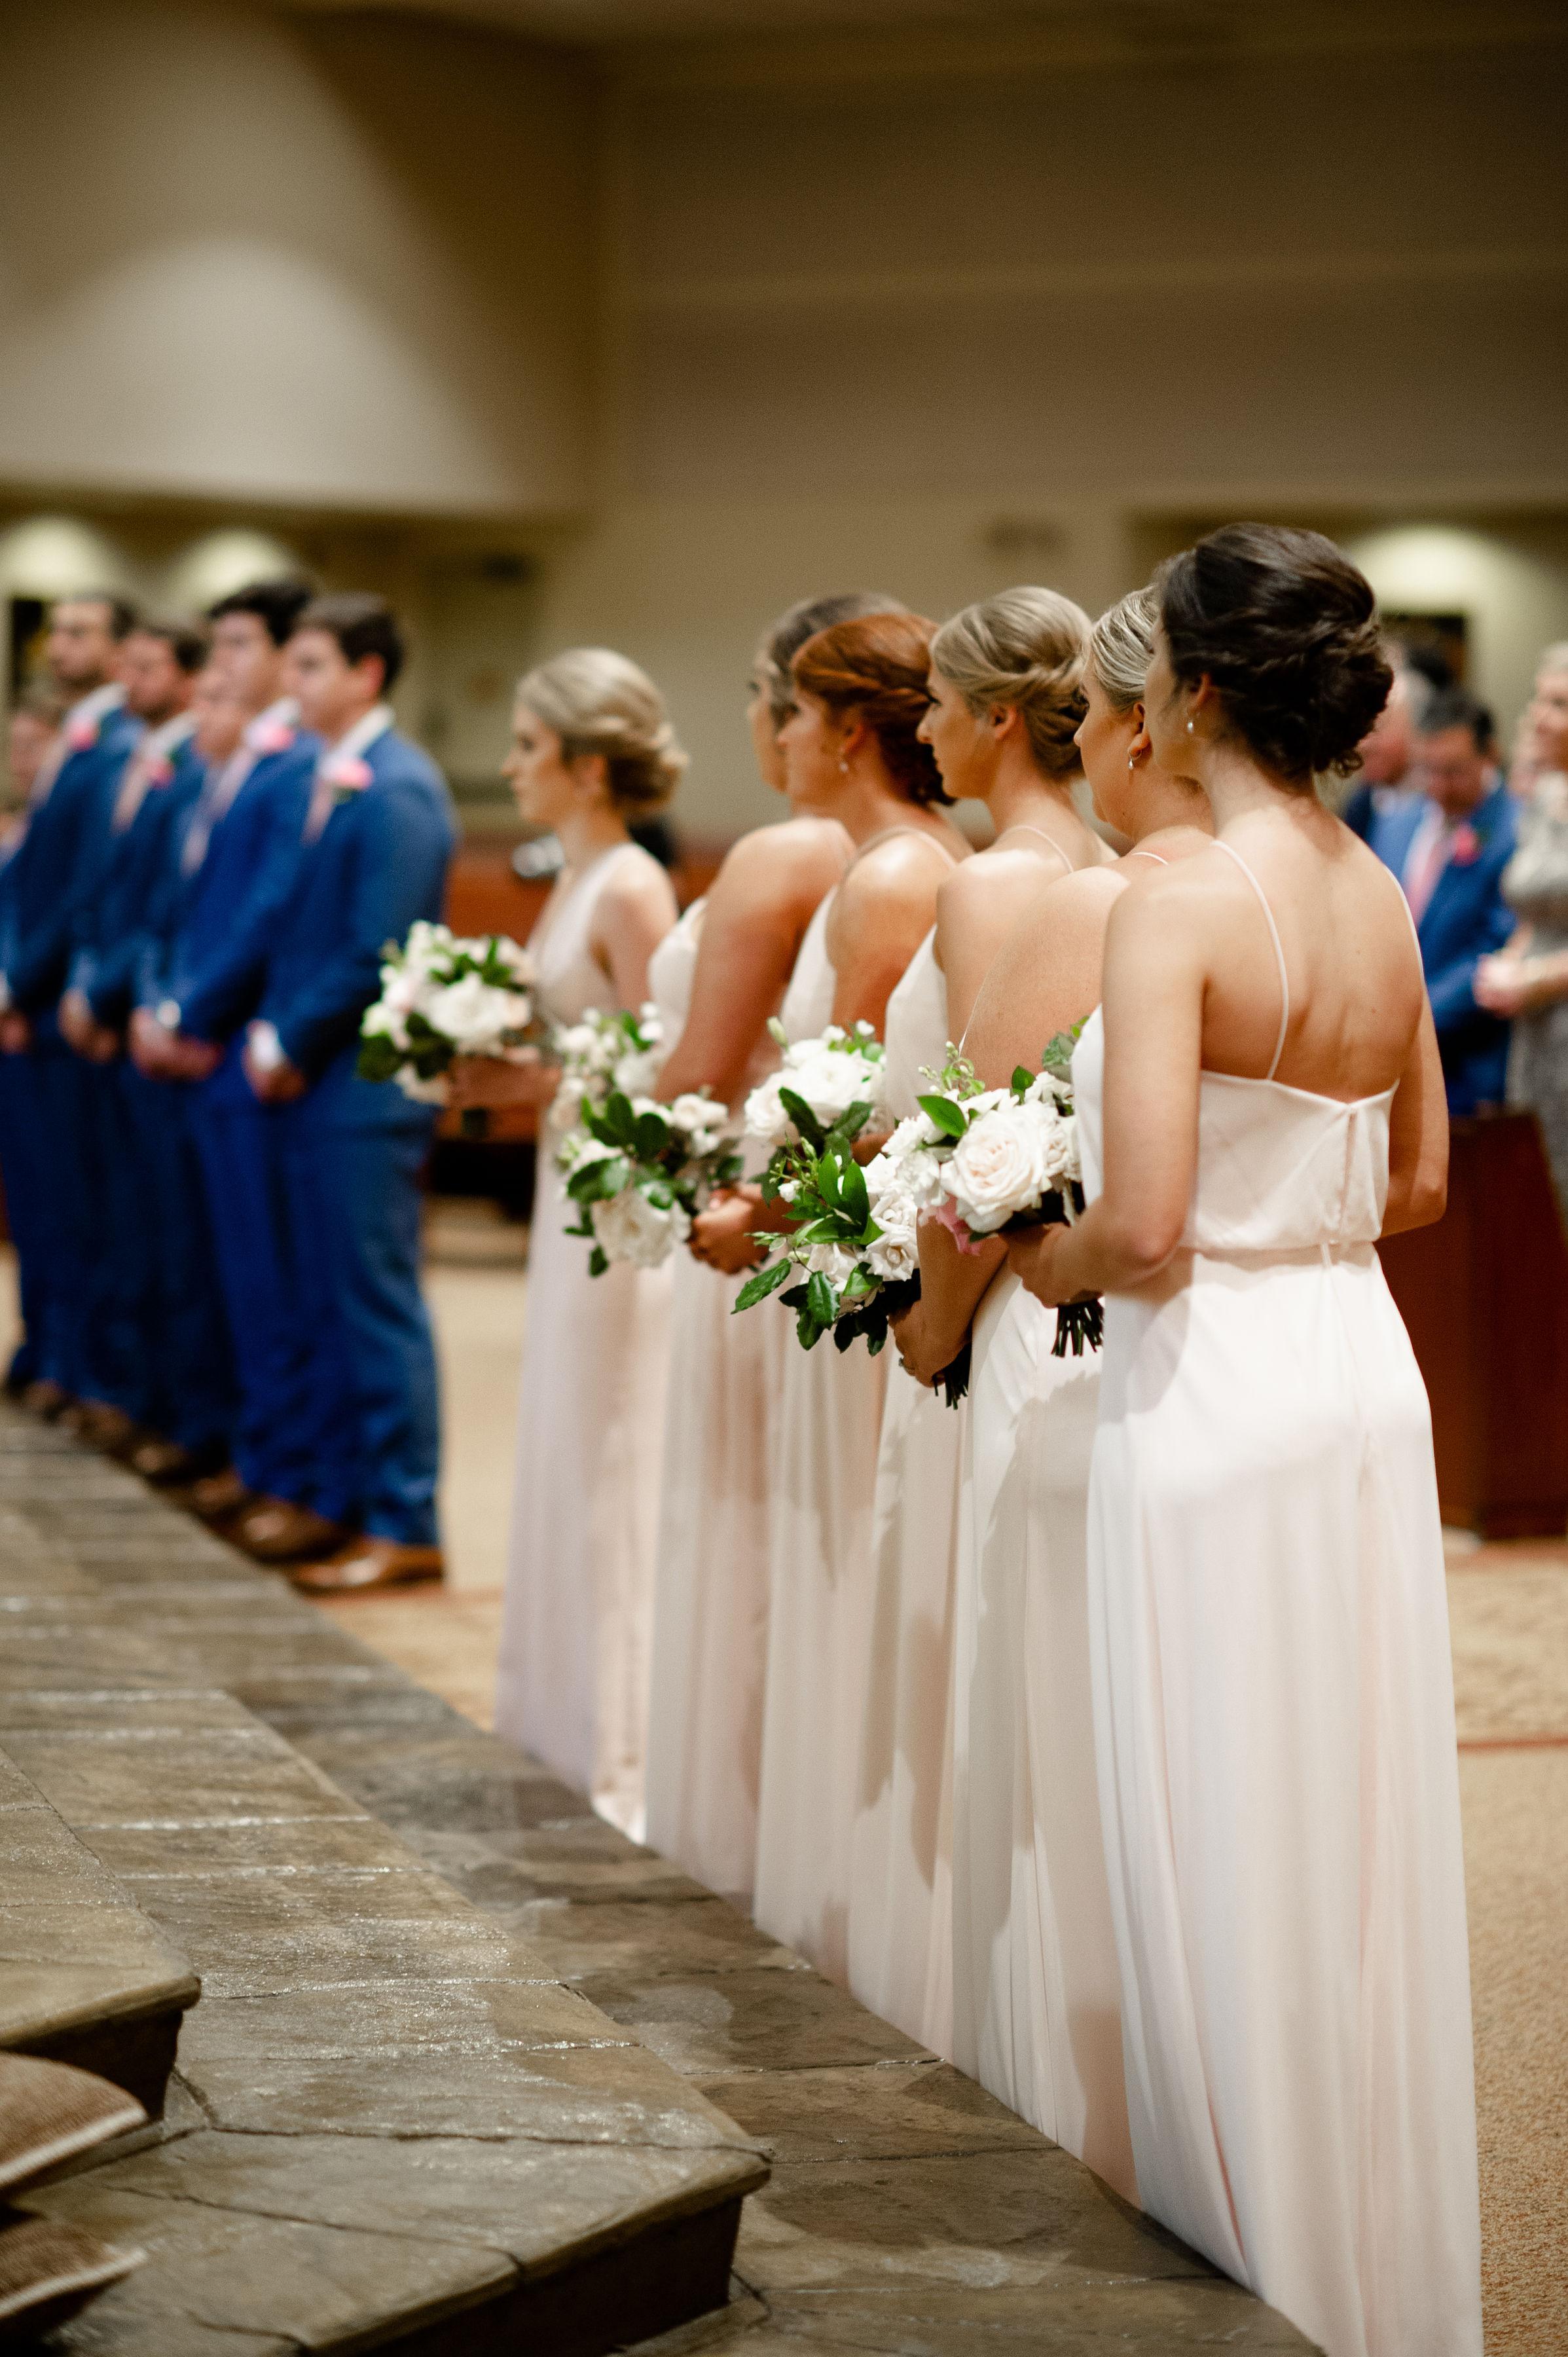 McElravey_Wedding_CarolineLimaPhotography_2018_110.jpg